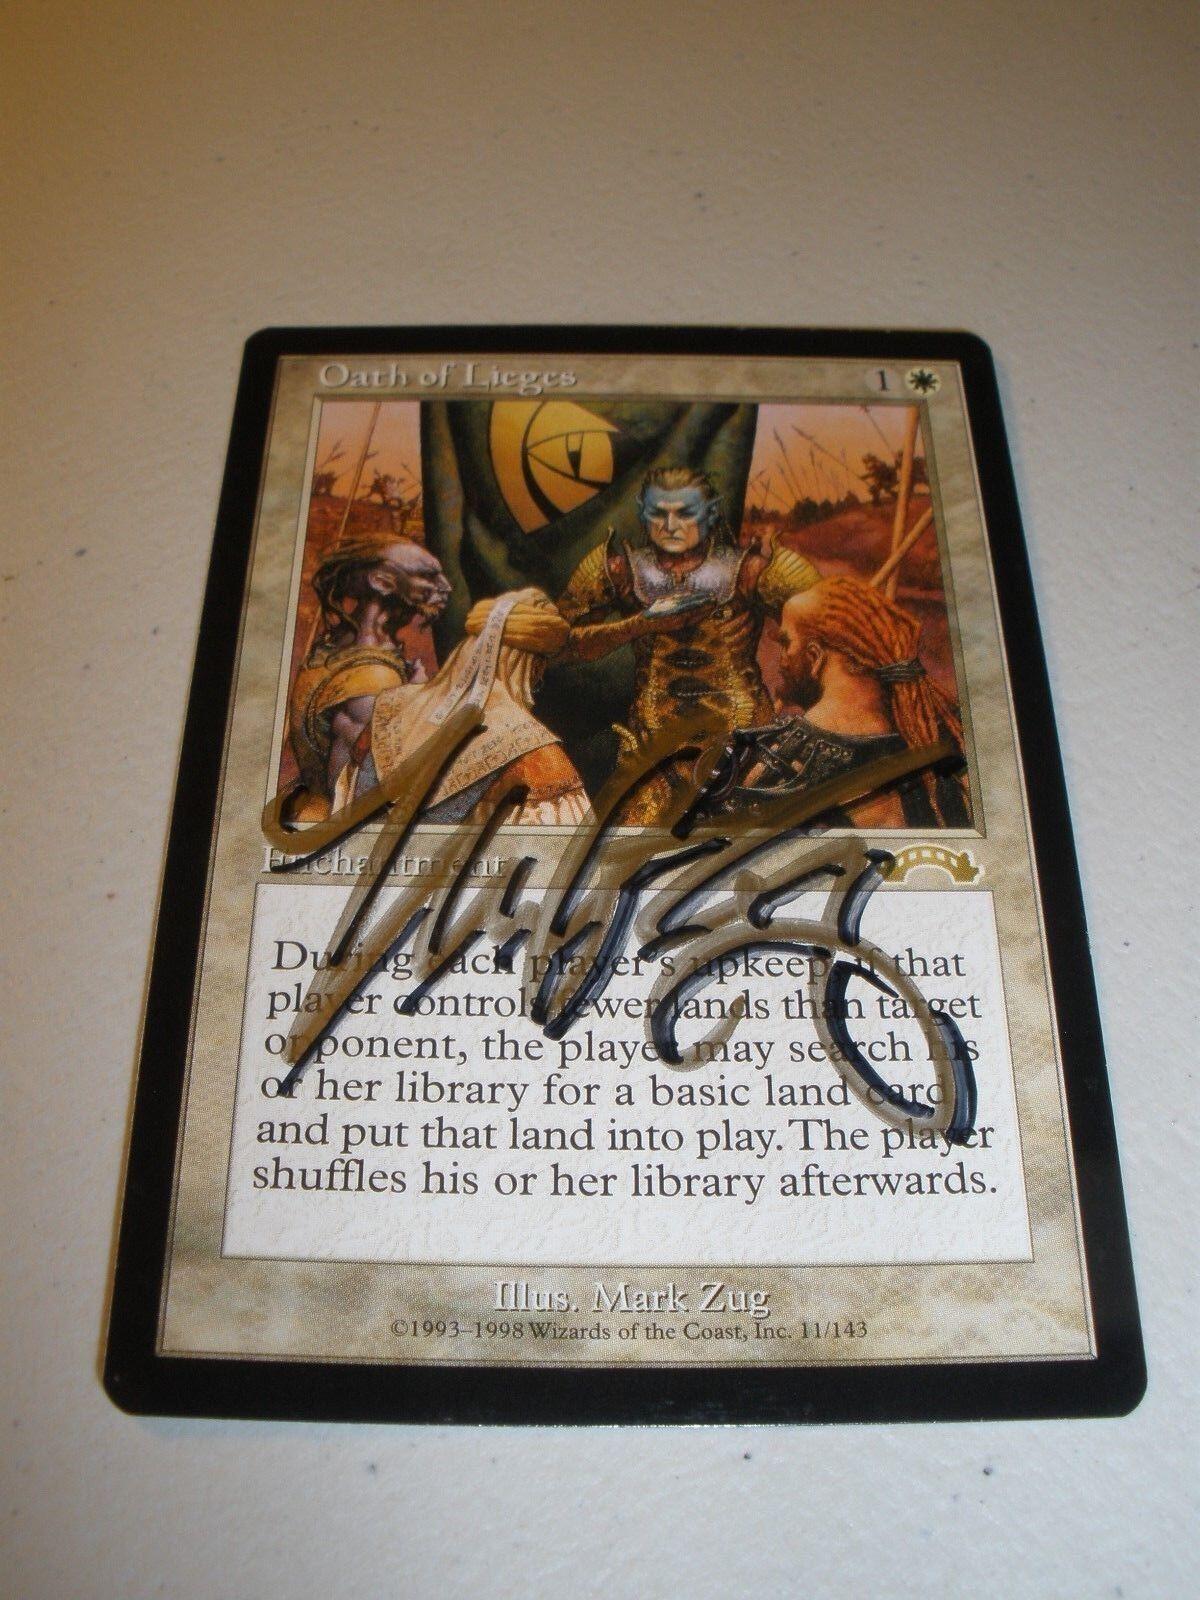 MTG Magic Signed (Mark Zug) Artist Proof Oath of Lieges x1 Exodus LP-NM